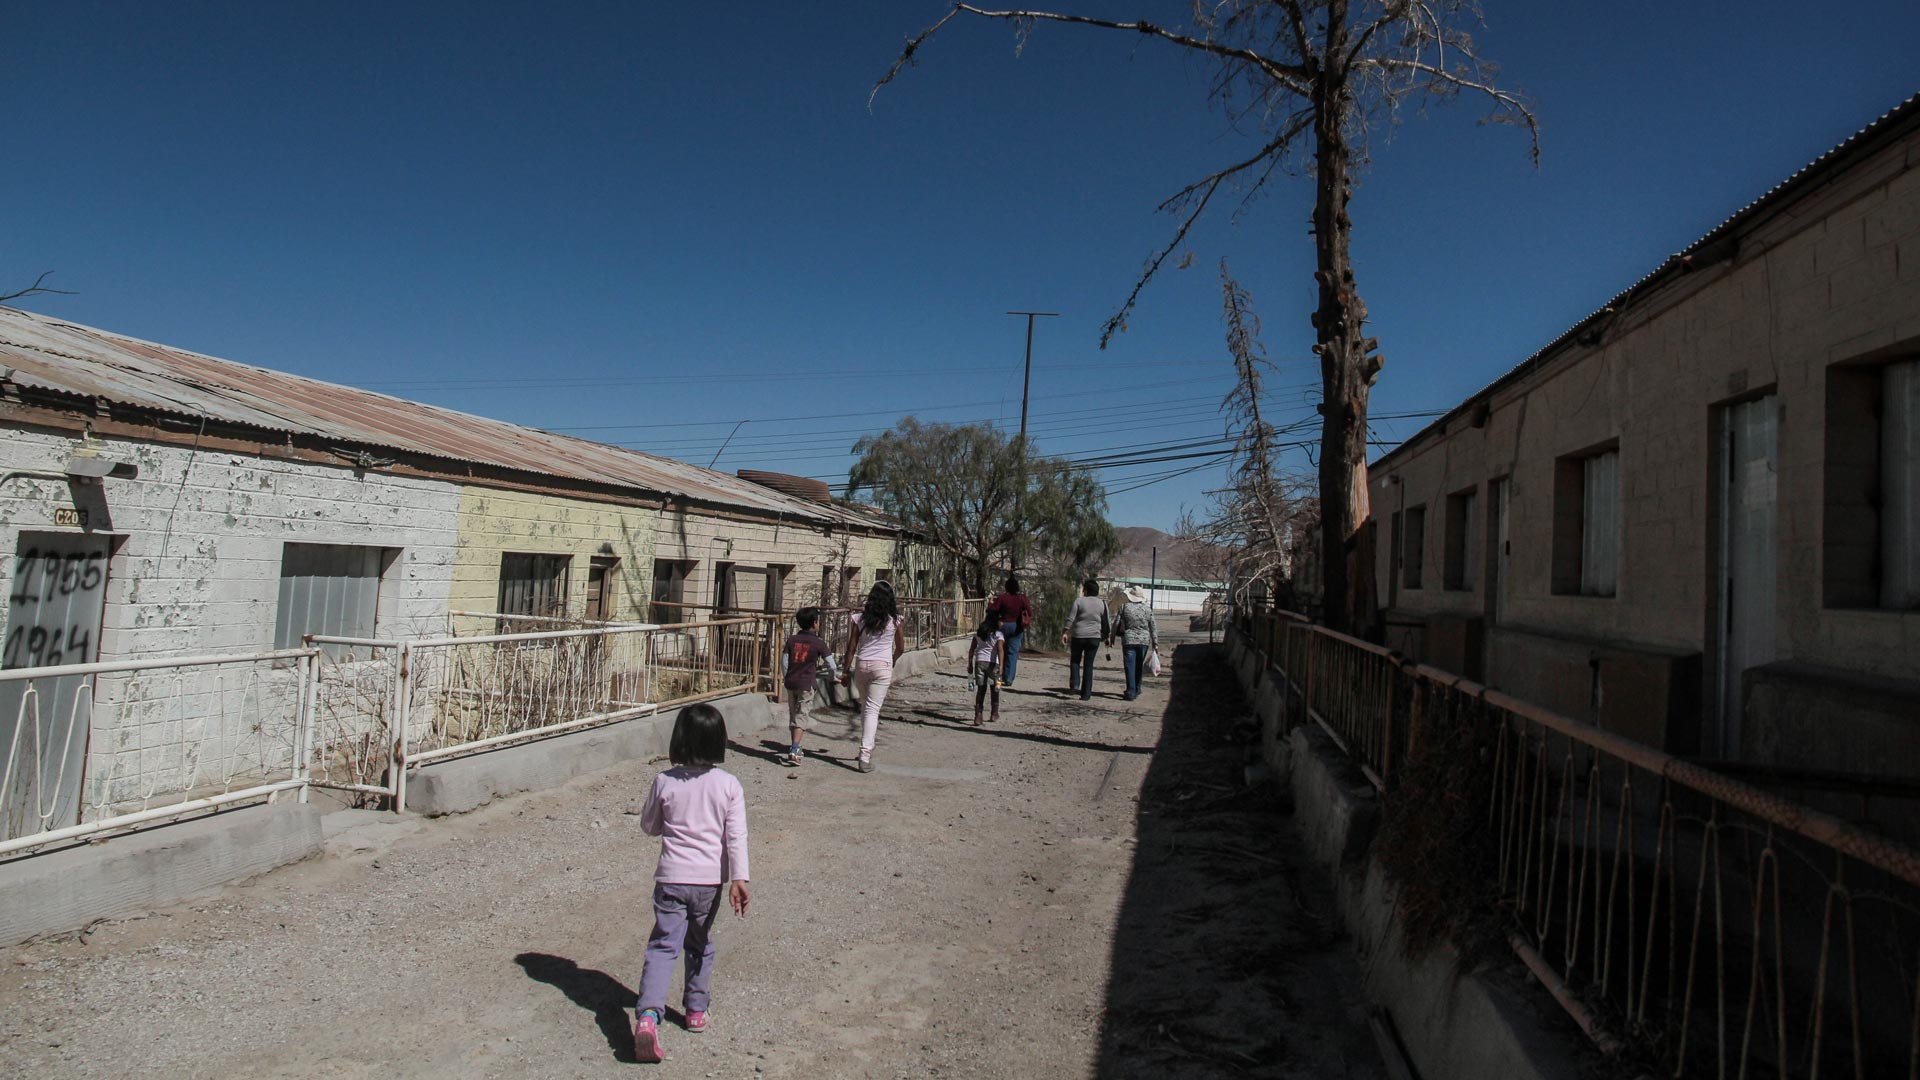 Chuquicamata_Yevenes_04_CAJA